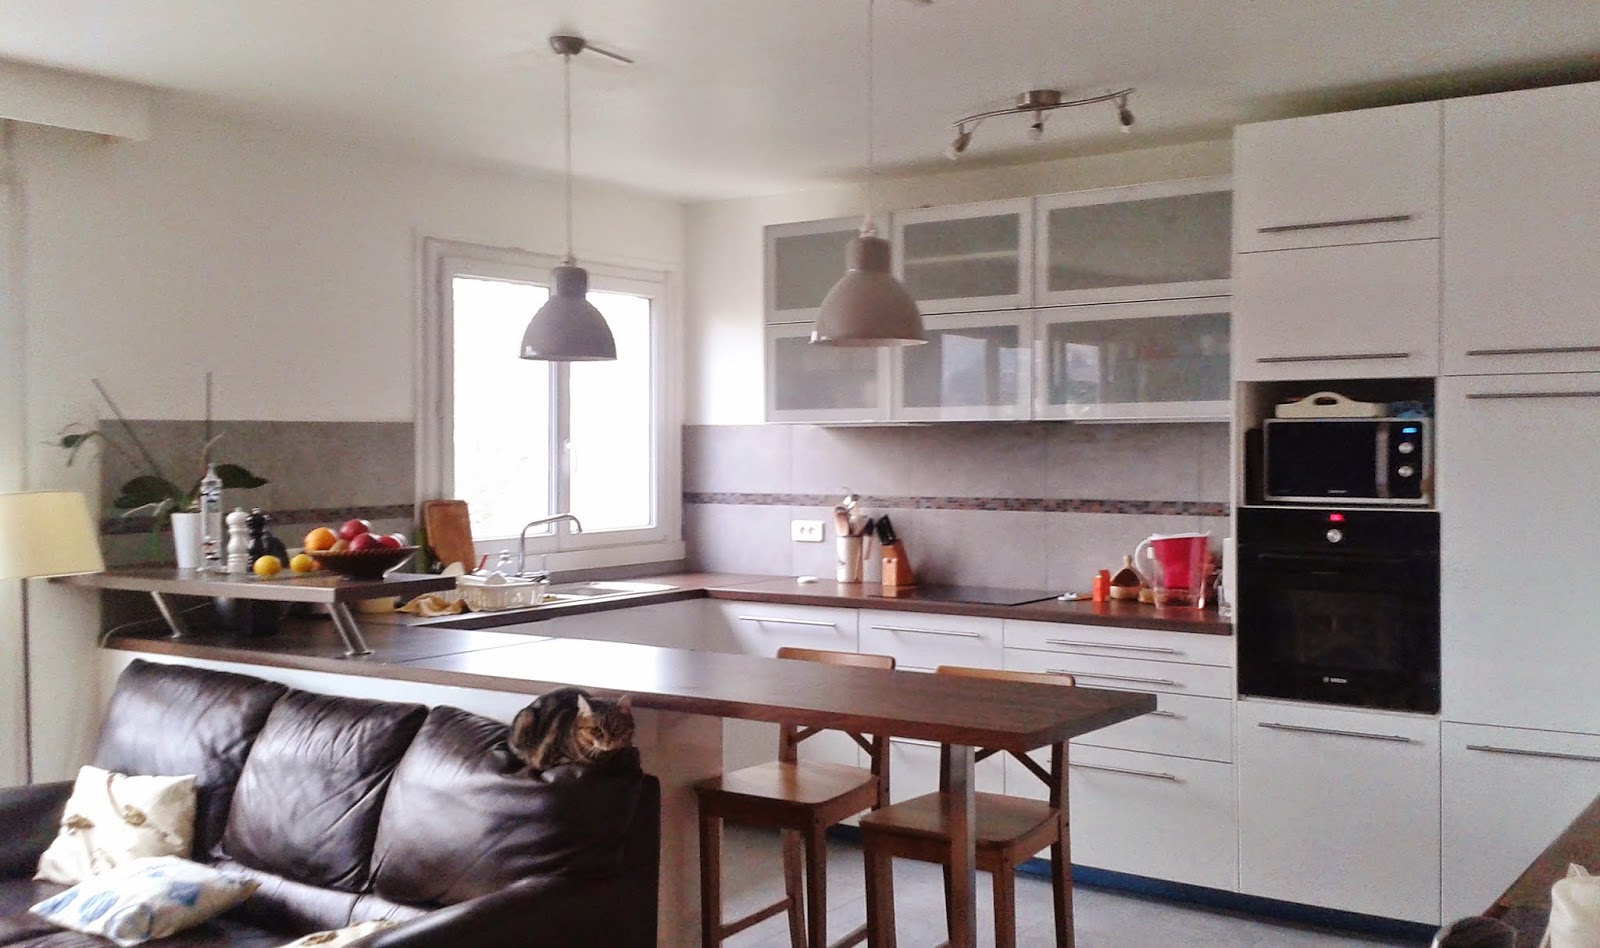 Emejing cuisine ouverte petit espace pictures design - Idee cuisine petit espace ...